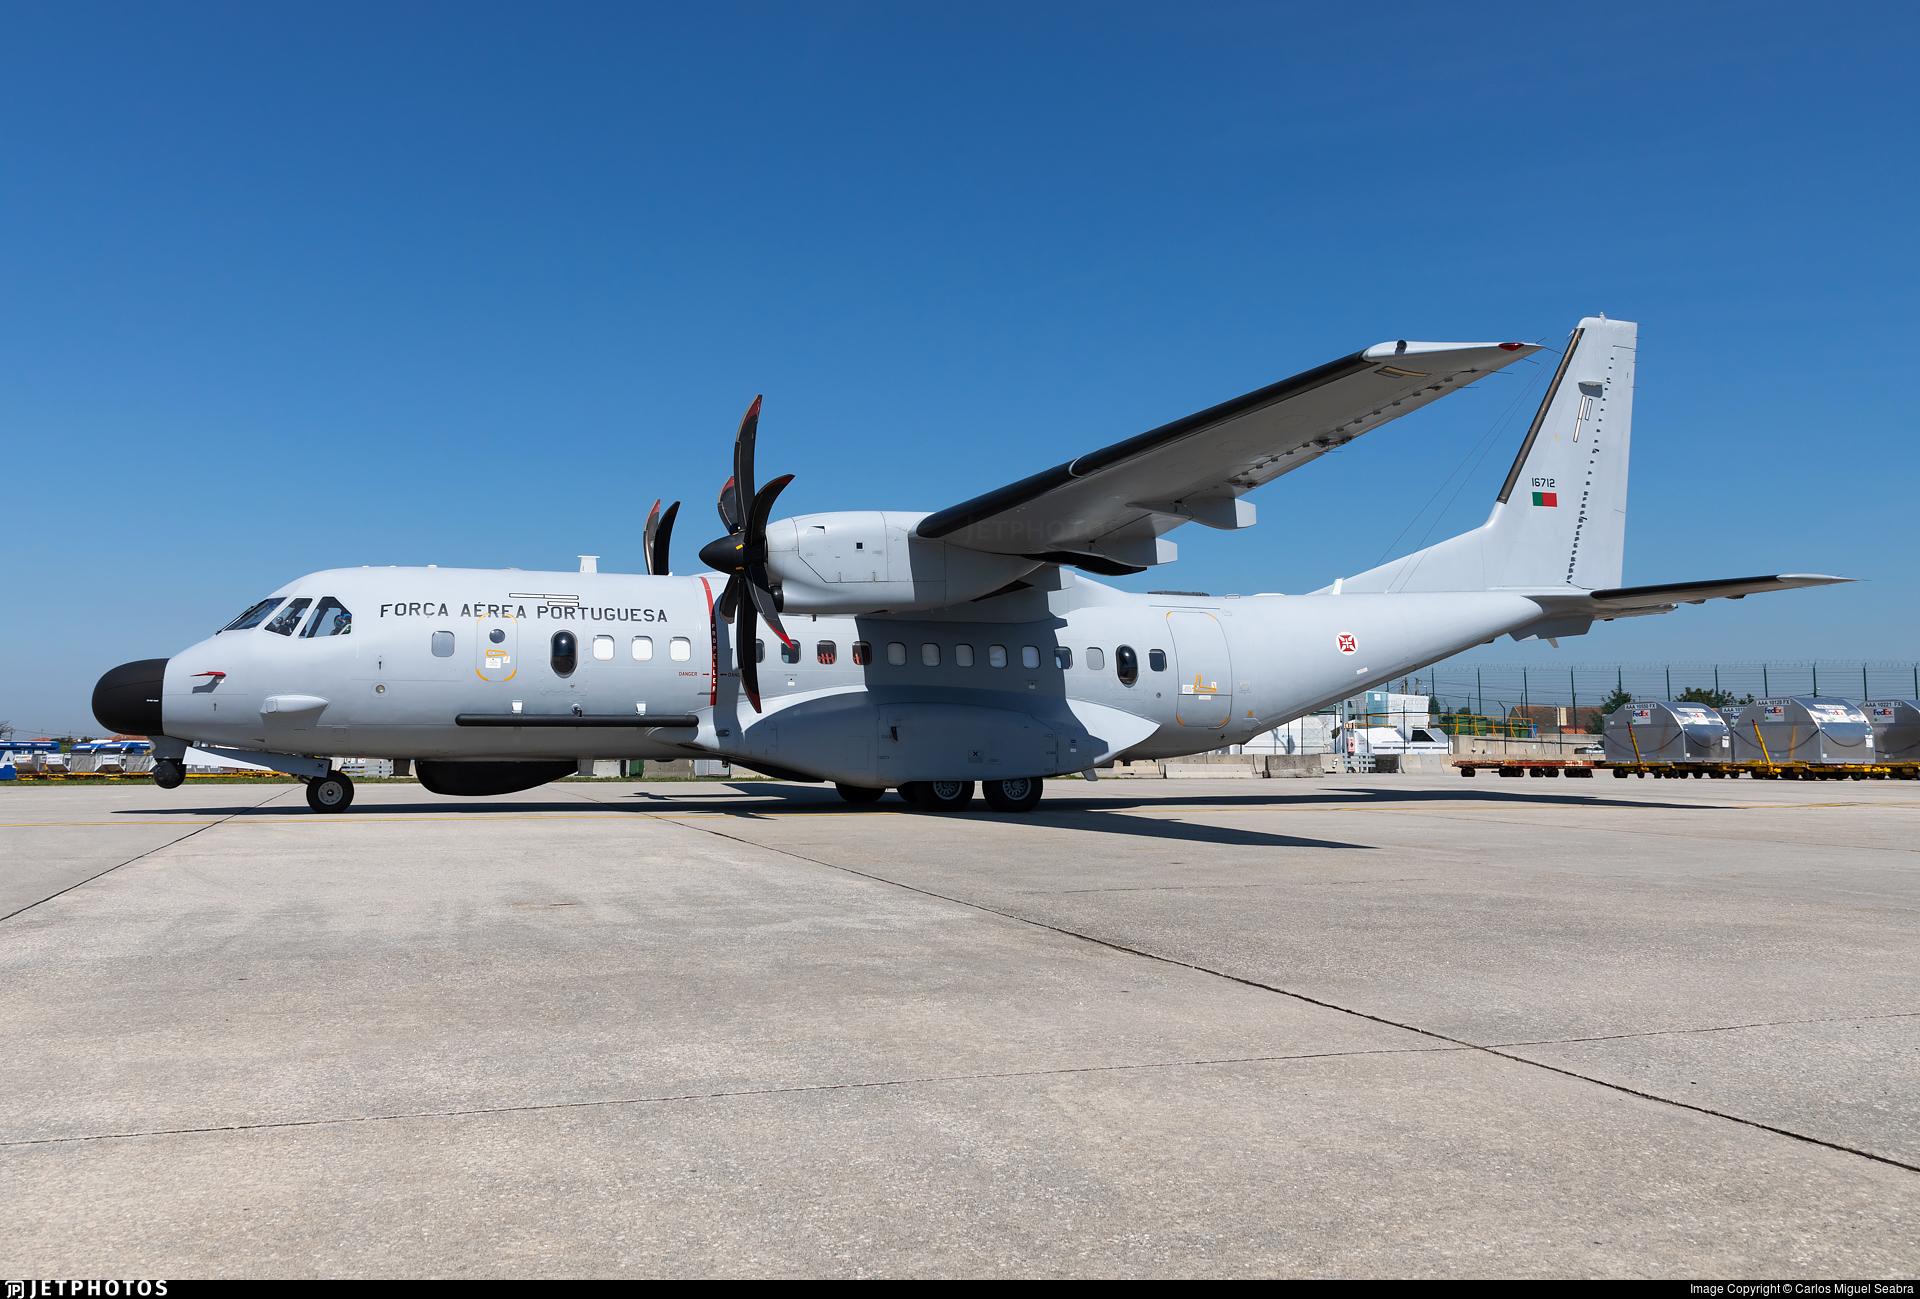 16712 - CASA C-295MP Persuader - Portugal - Air Force